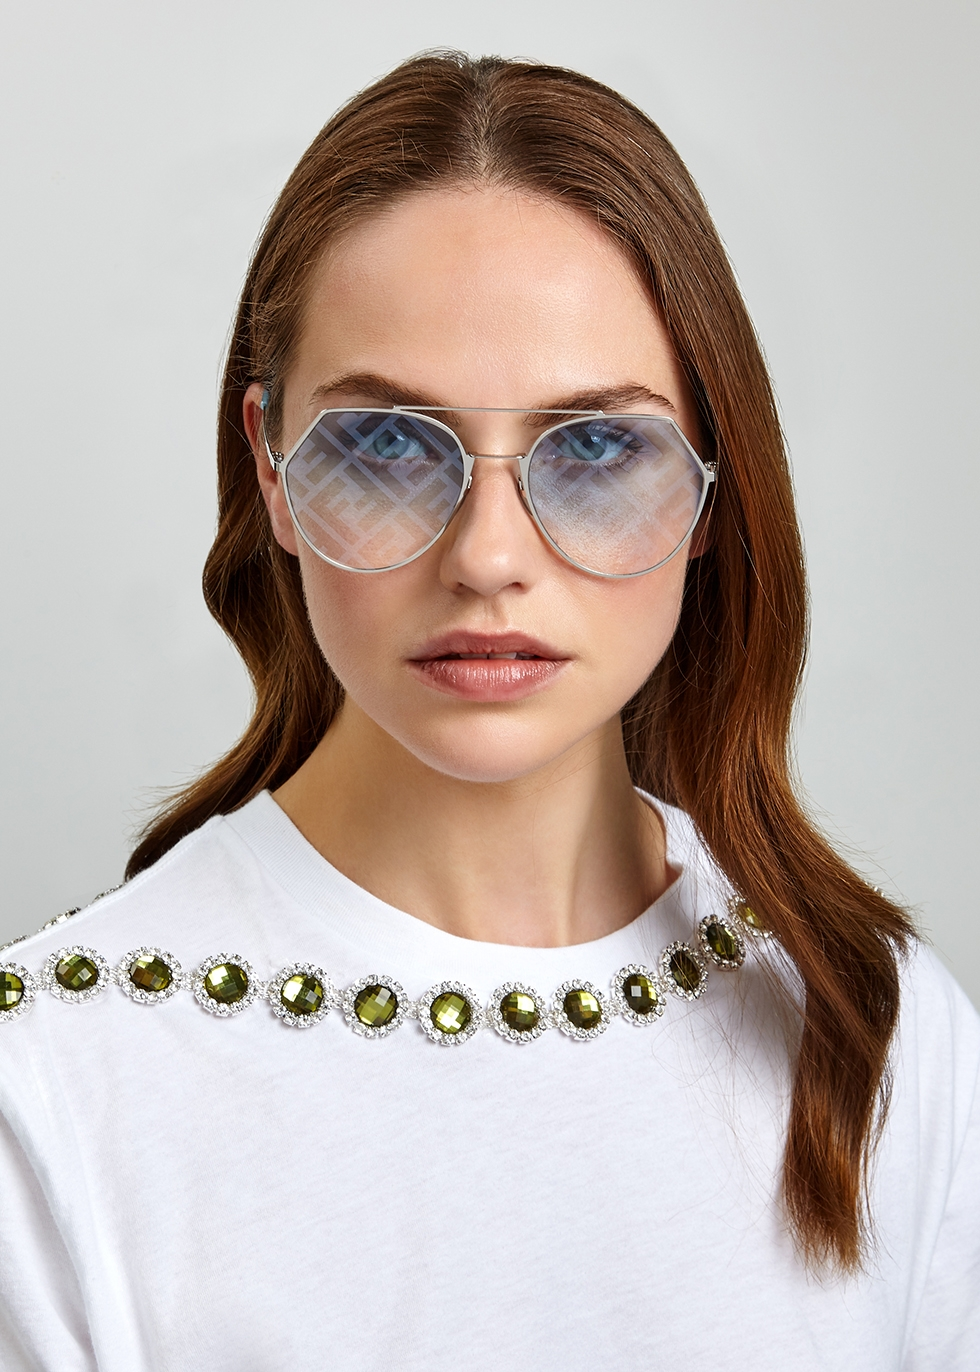 d5131b08f1 Women s Designer Sunglasses and Eyewear - Harvey Nichols